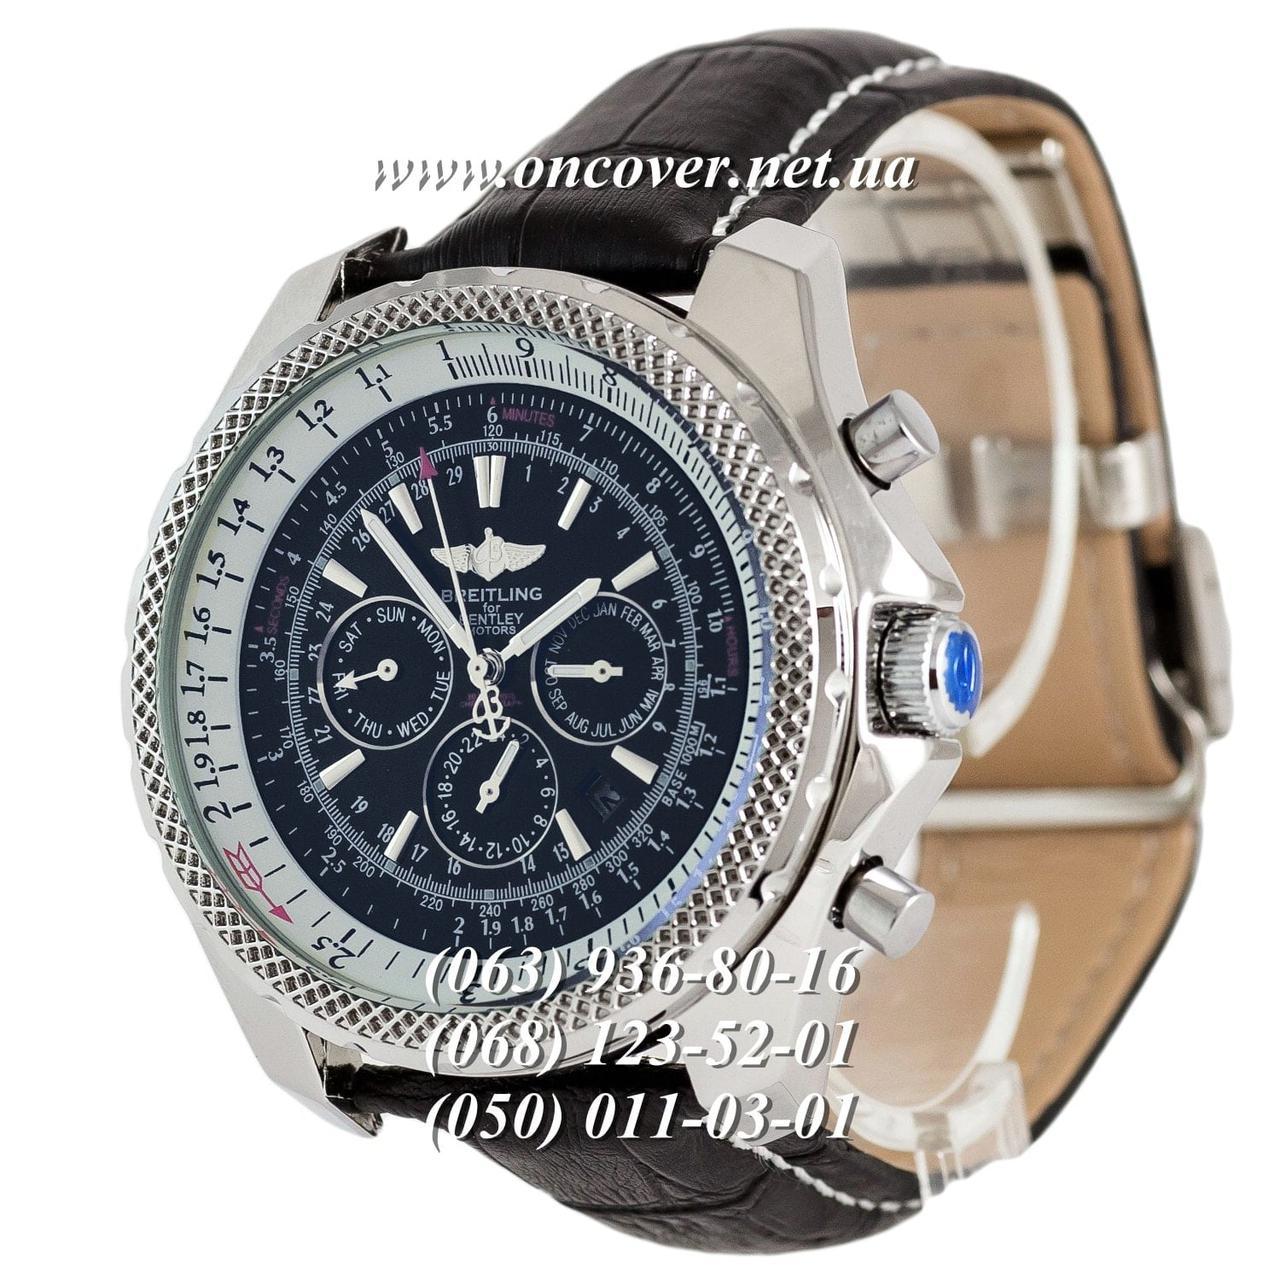 Мужские наручные часы брайтлинг купить наручные часы коламбус